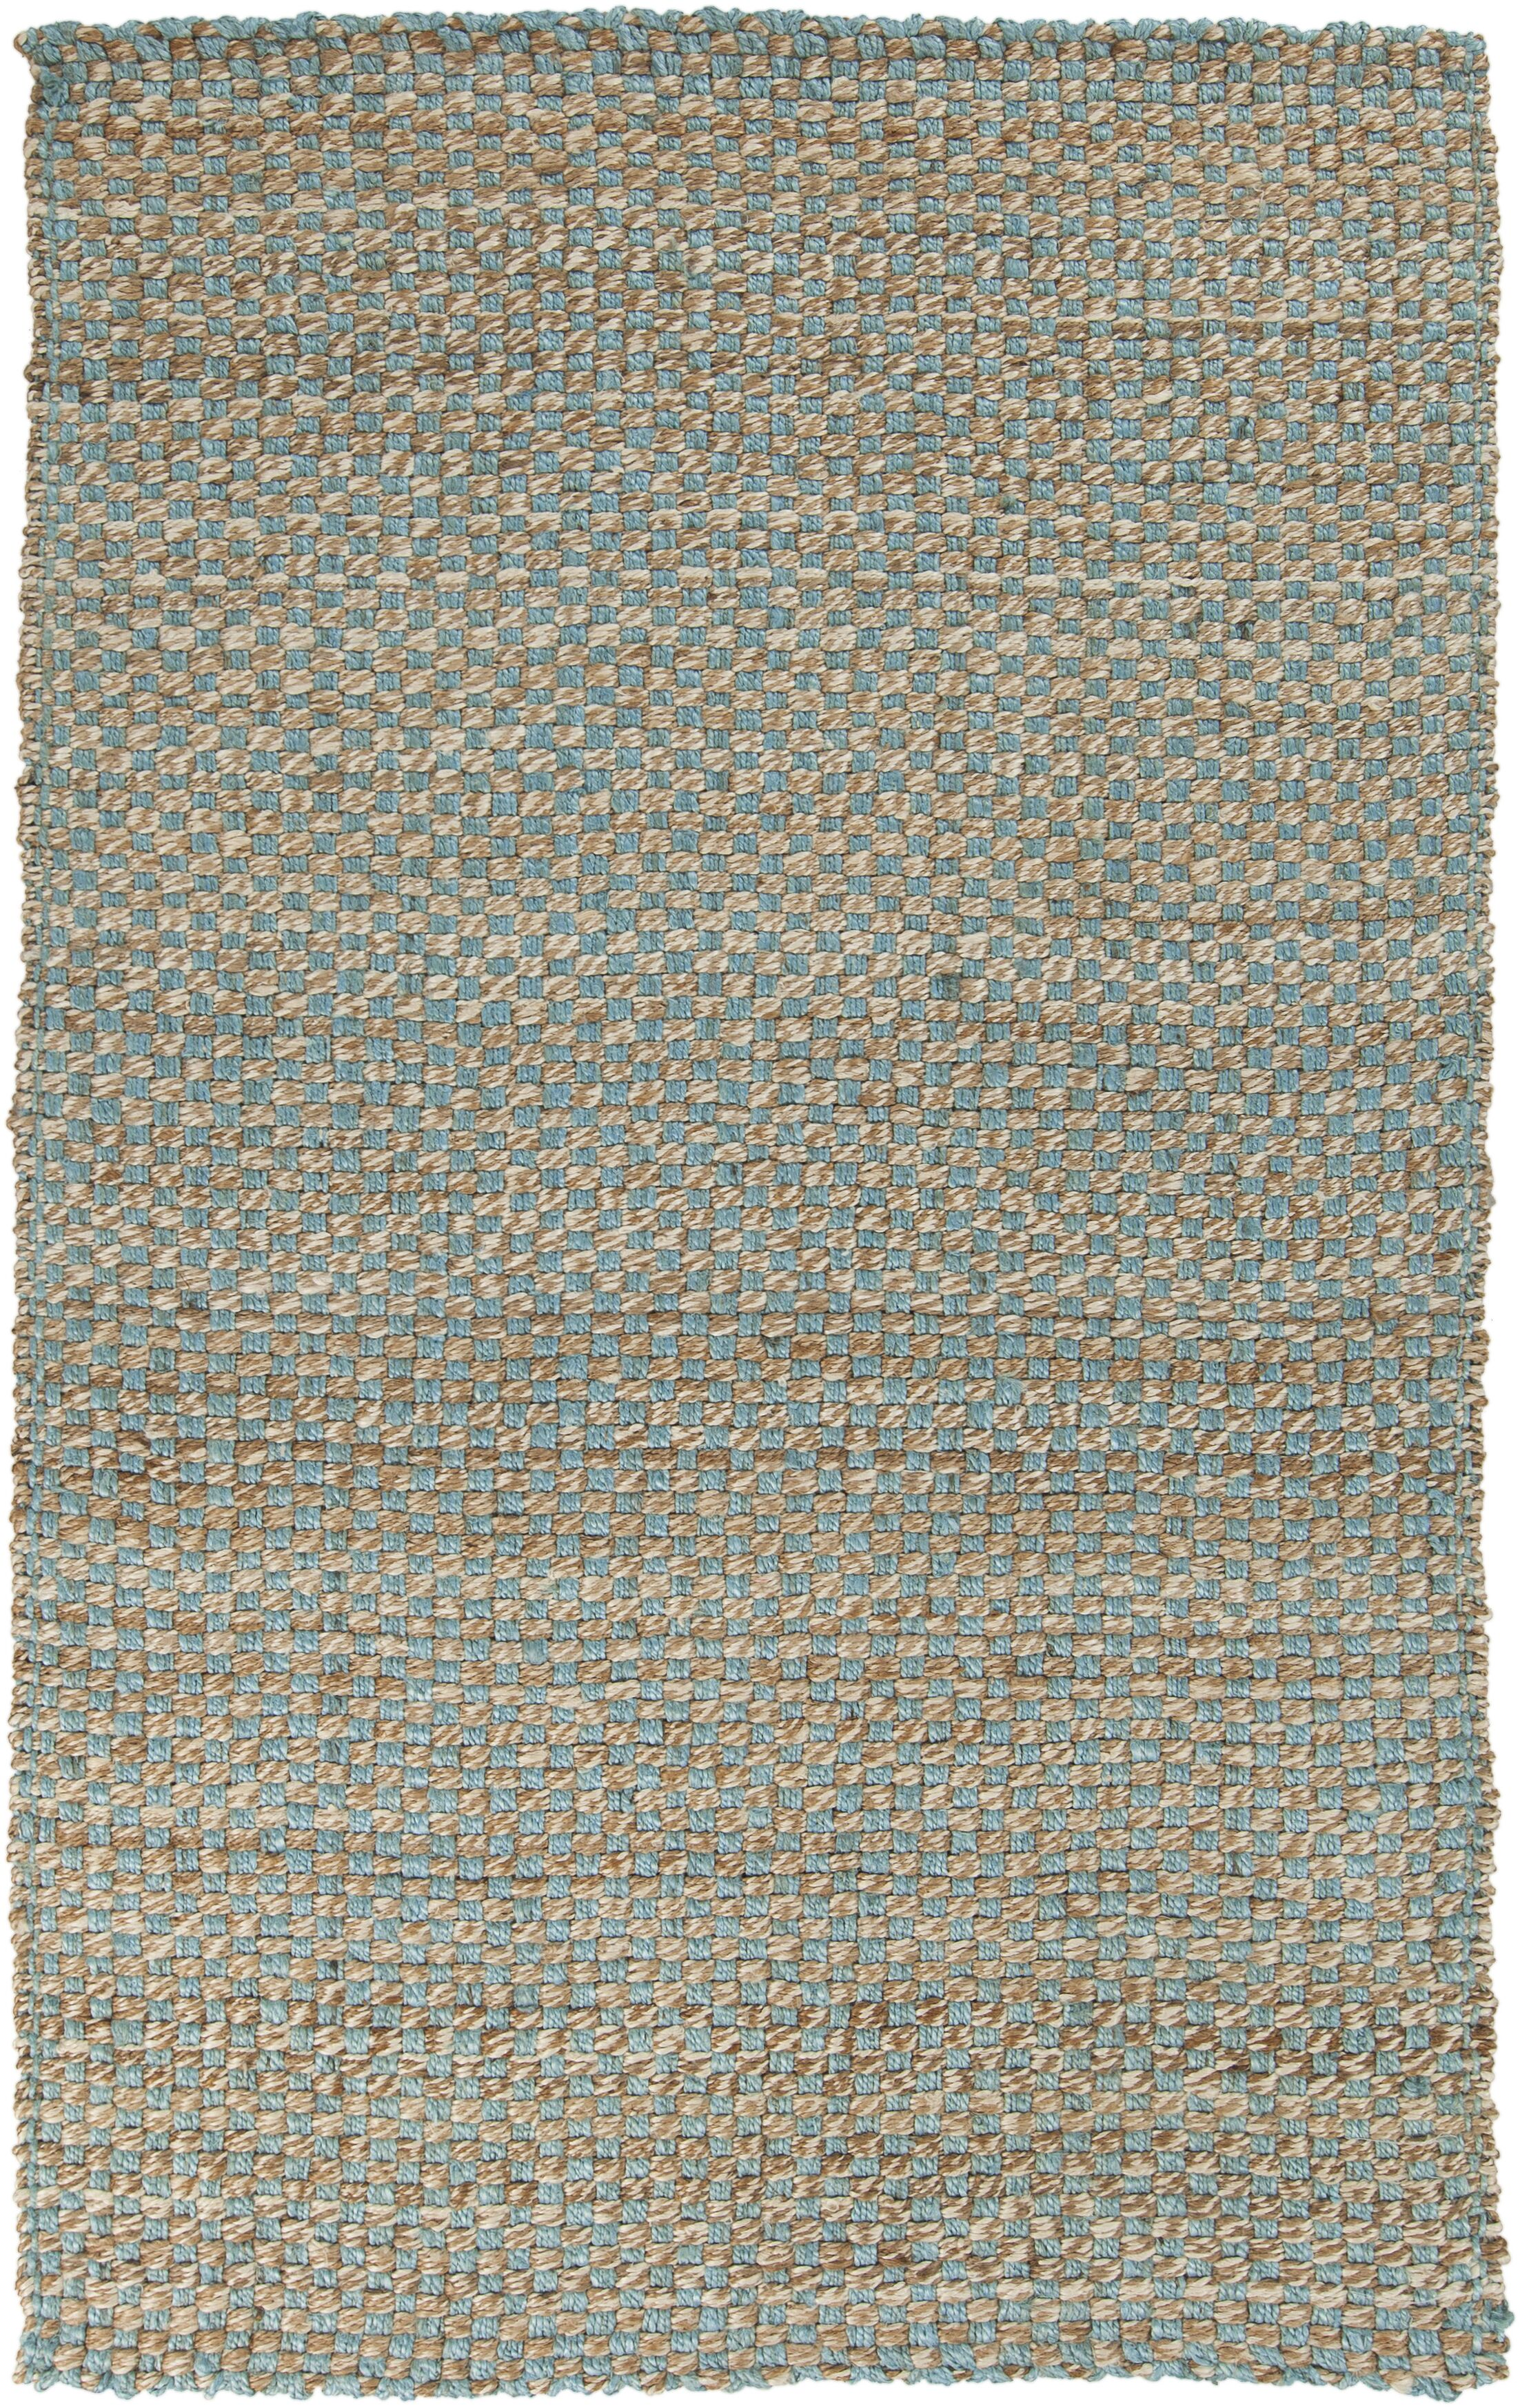 Jaidan Powder Blue Rug Rug Size: Rectangle 5' x 8'